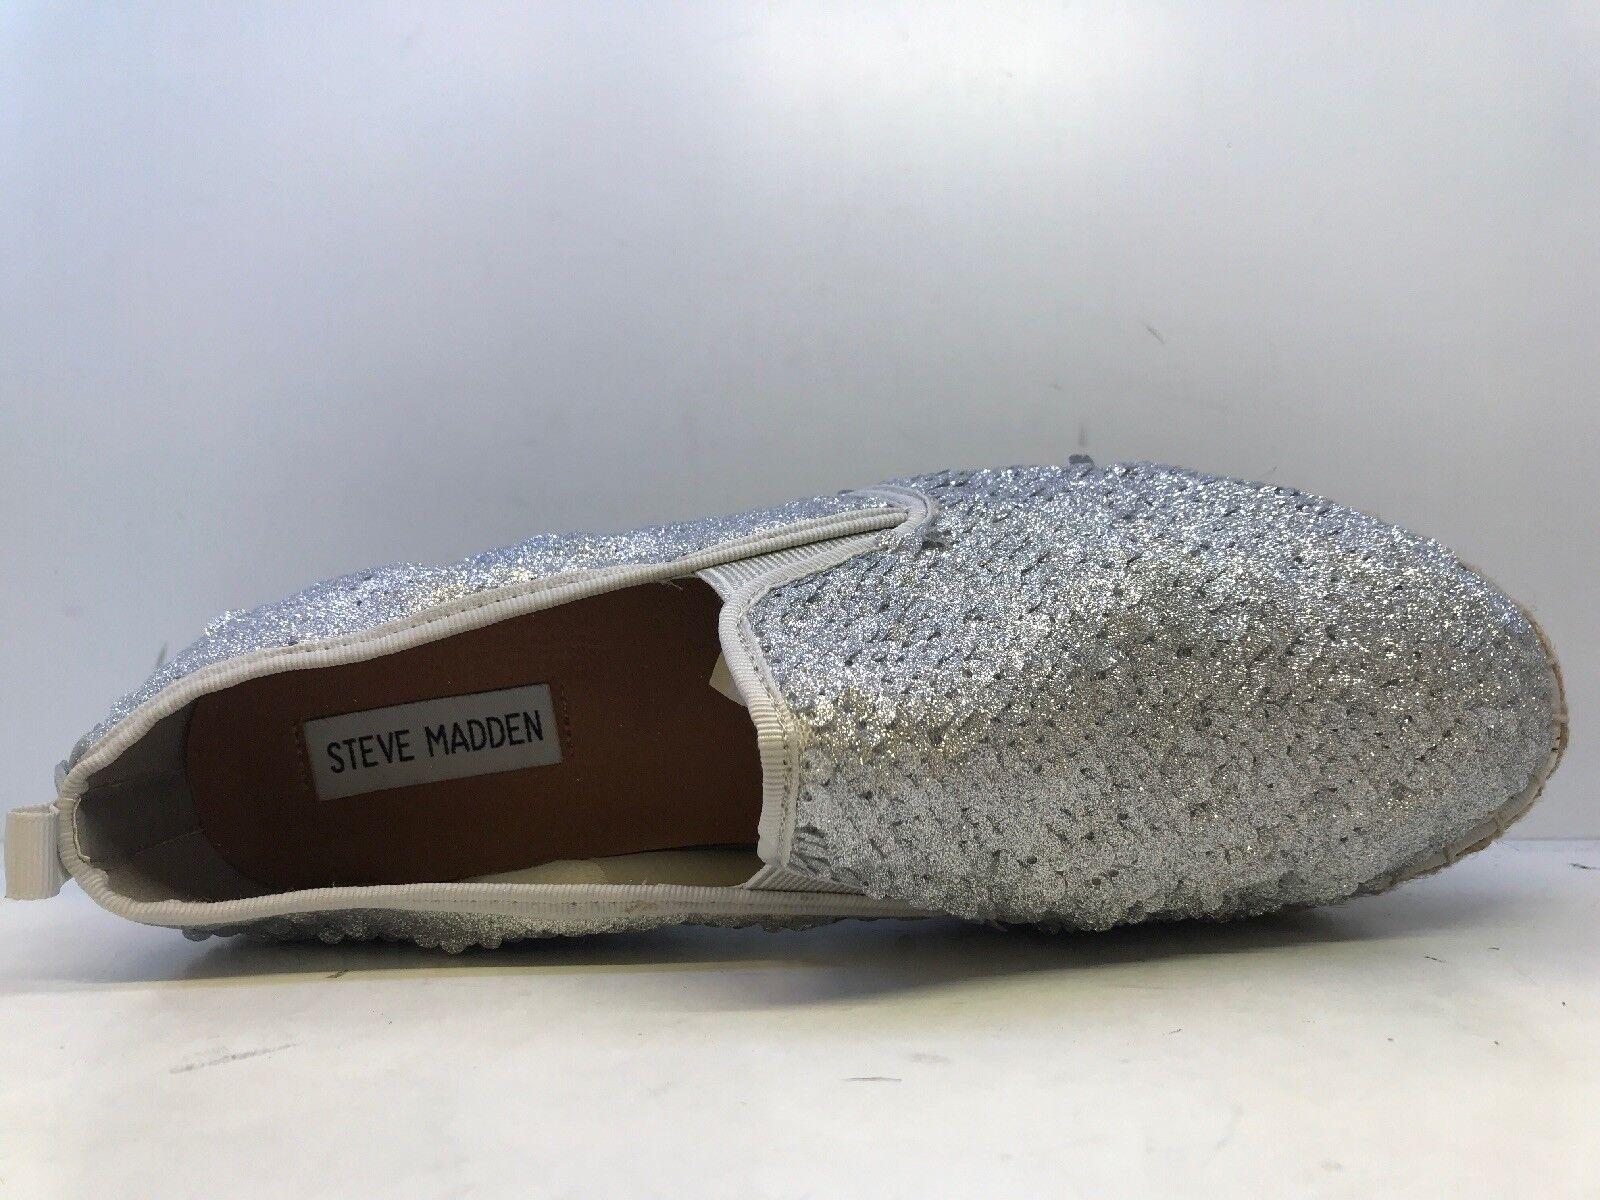 ab99f03fc50770 ... Steve Madden Poppi Femmes argent pailletées Espadrilles Chaussures UK  Taille Taille Taille 6 | Jolie Et